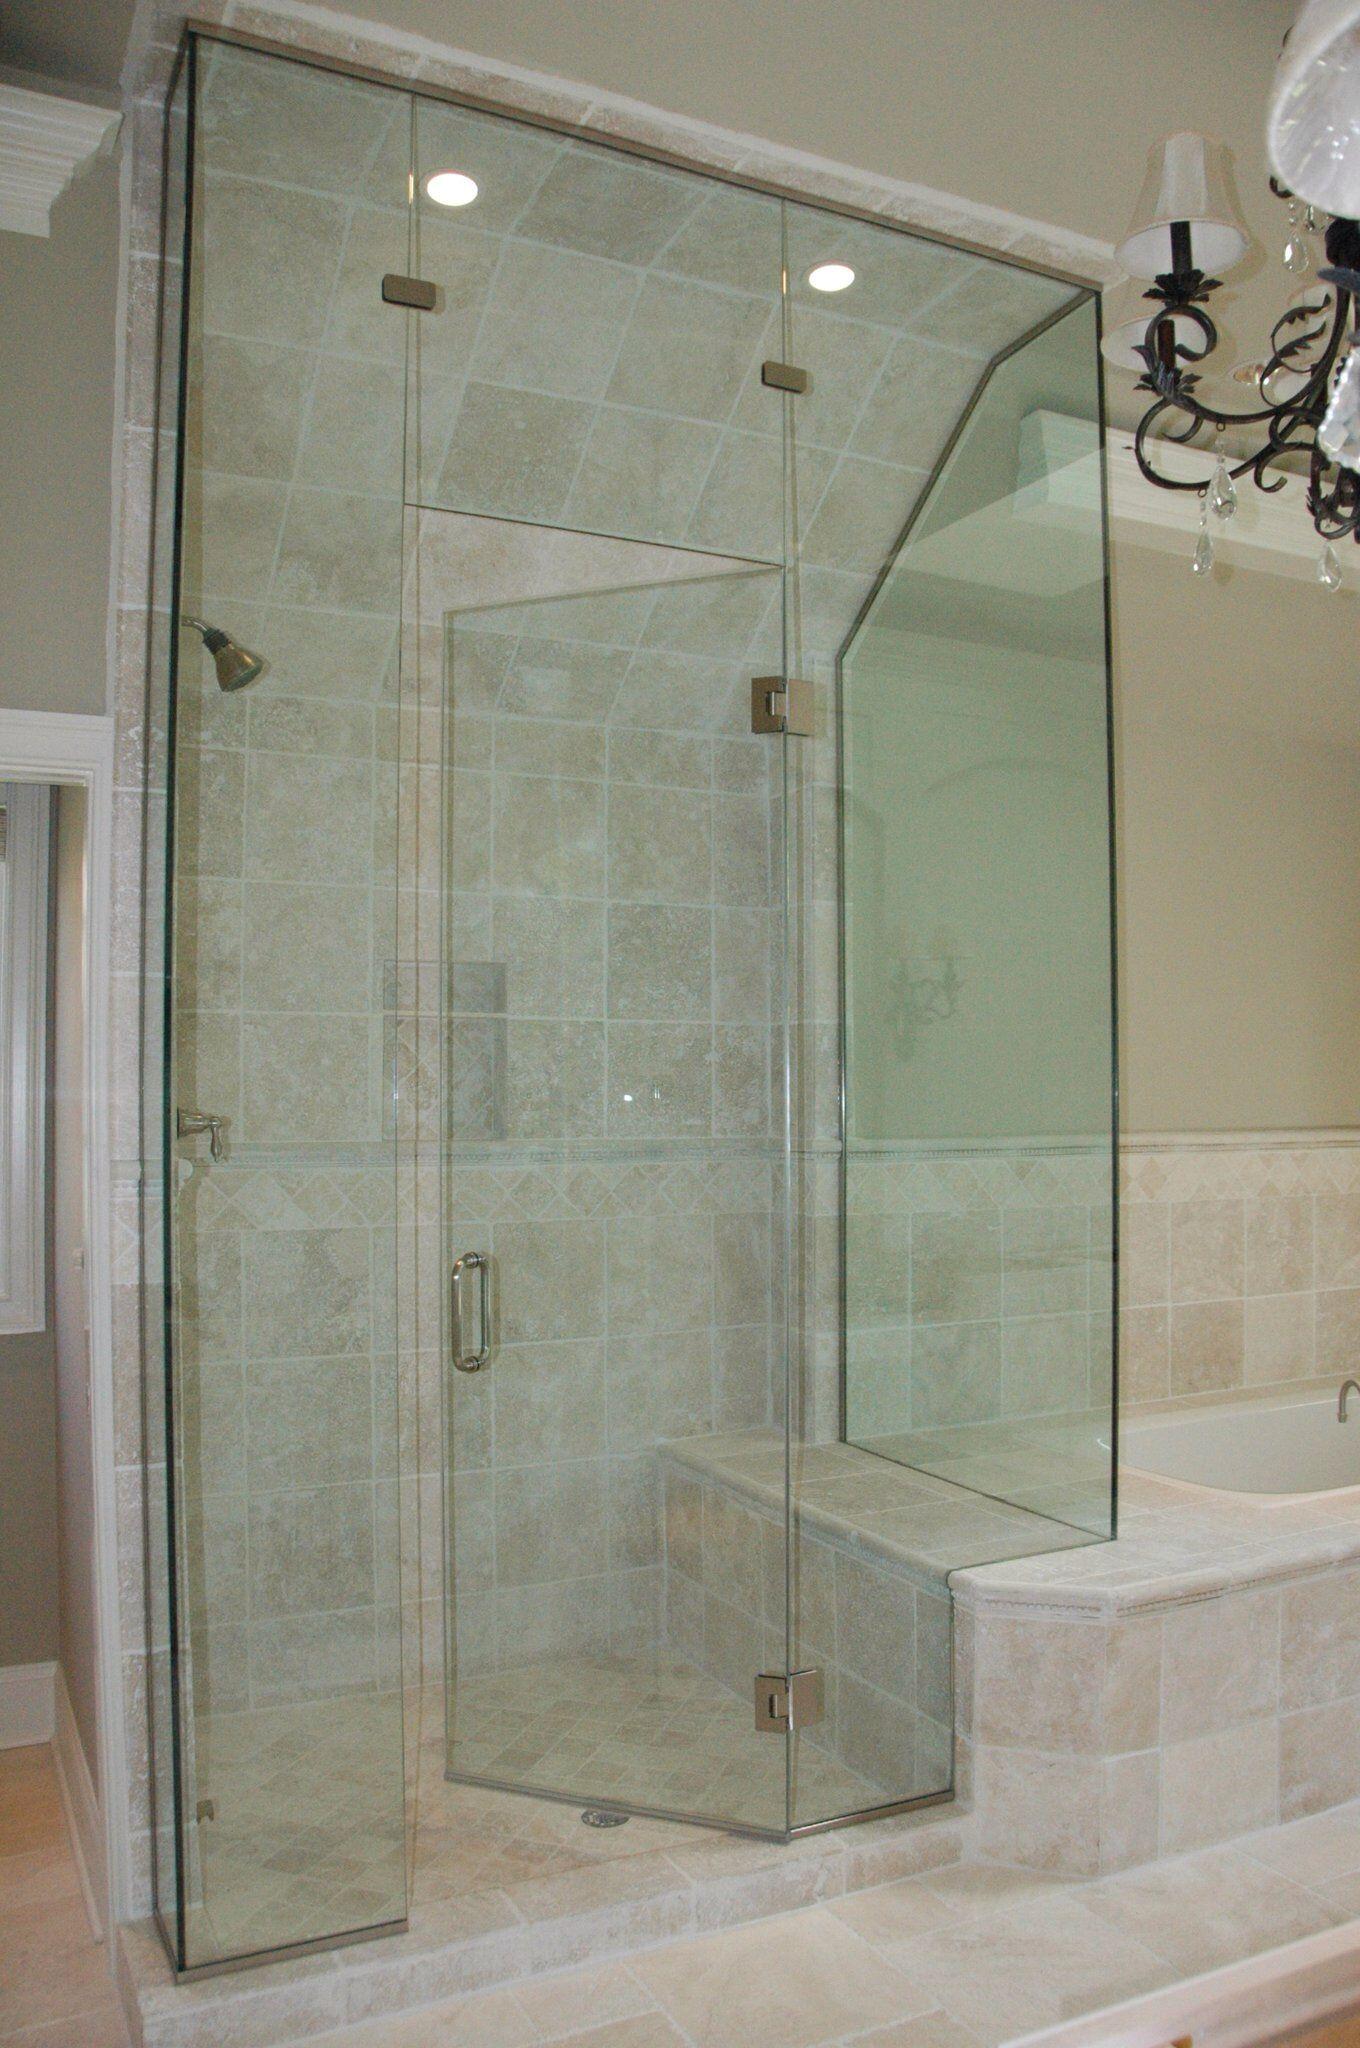 Frameless Clear Glass Shower Enclosure Bathroom Interior Glass Shower Enclosures Glass Shower